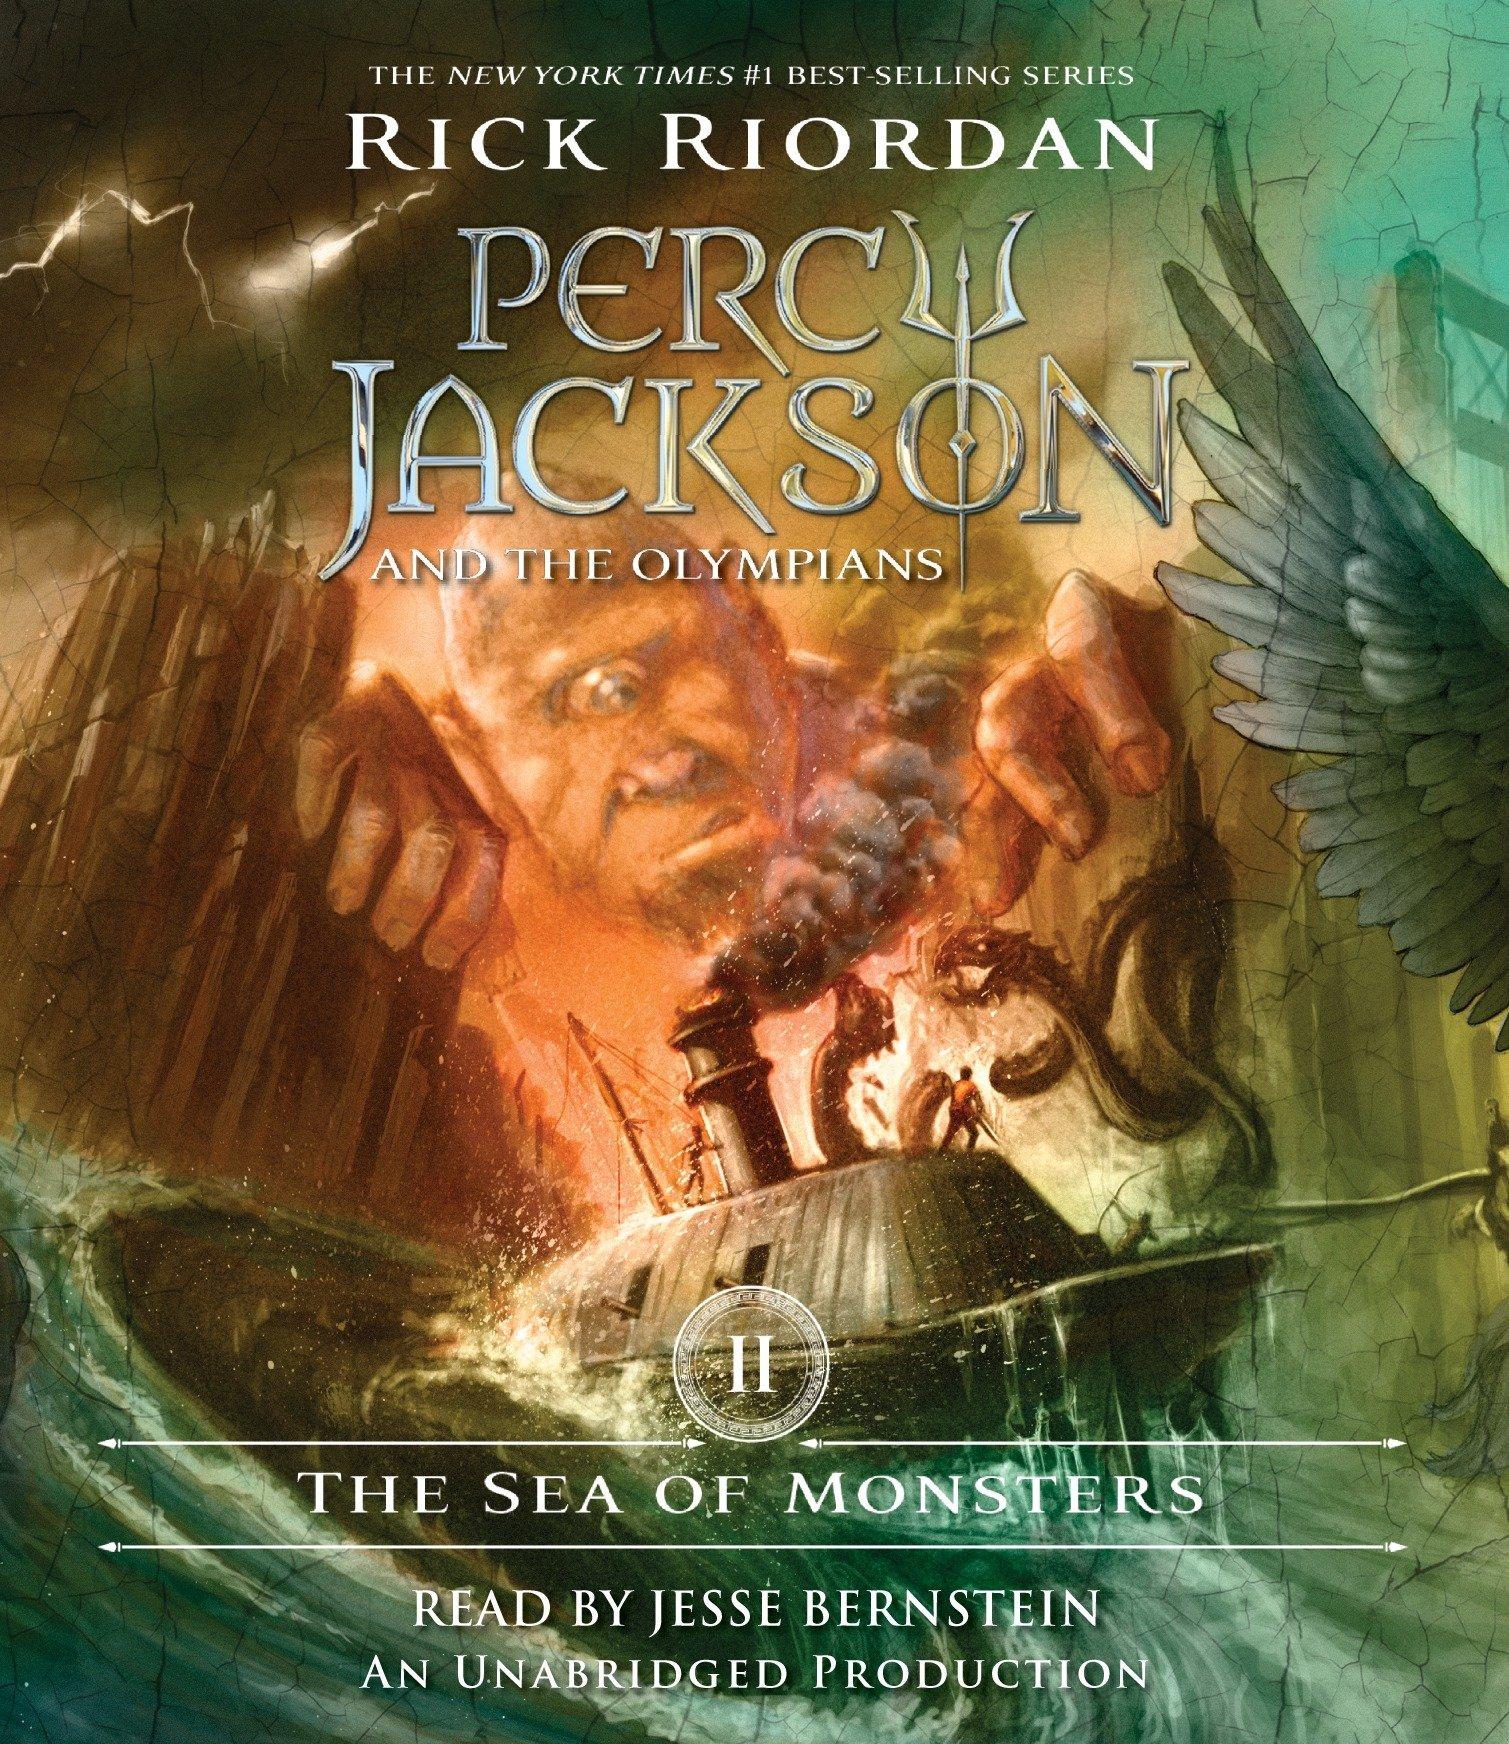 The Sea of Monsters: 02 Percy Jackson and the Olympians: Amazon.es: Riordan, Rick, Bernstein, Jesse: Libros en idiomas extranjeros